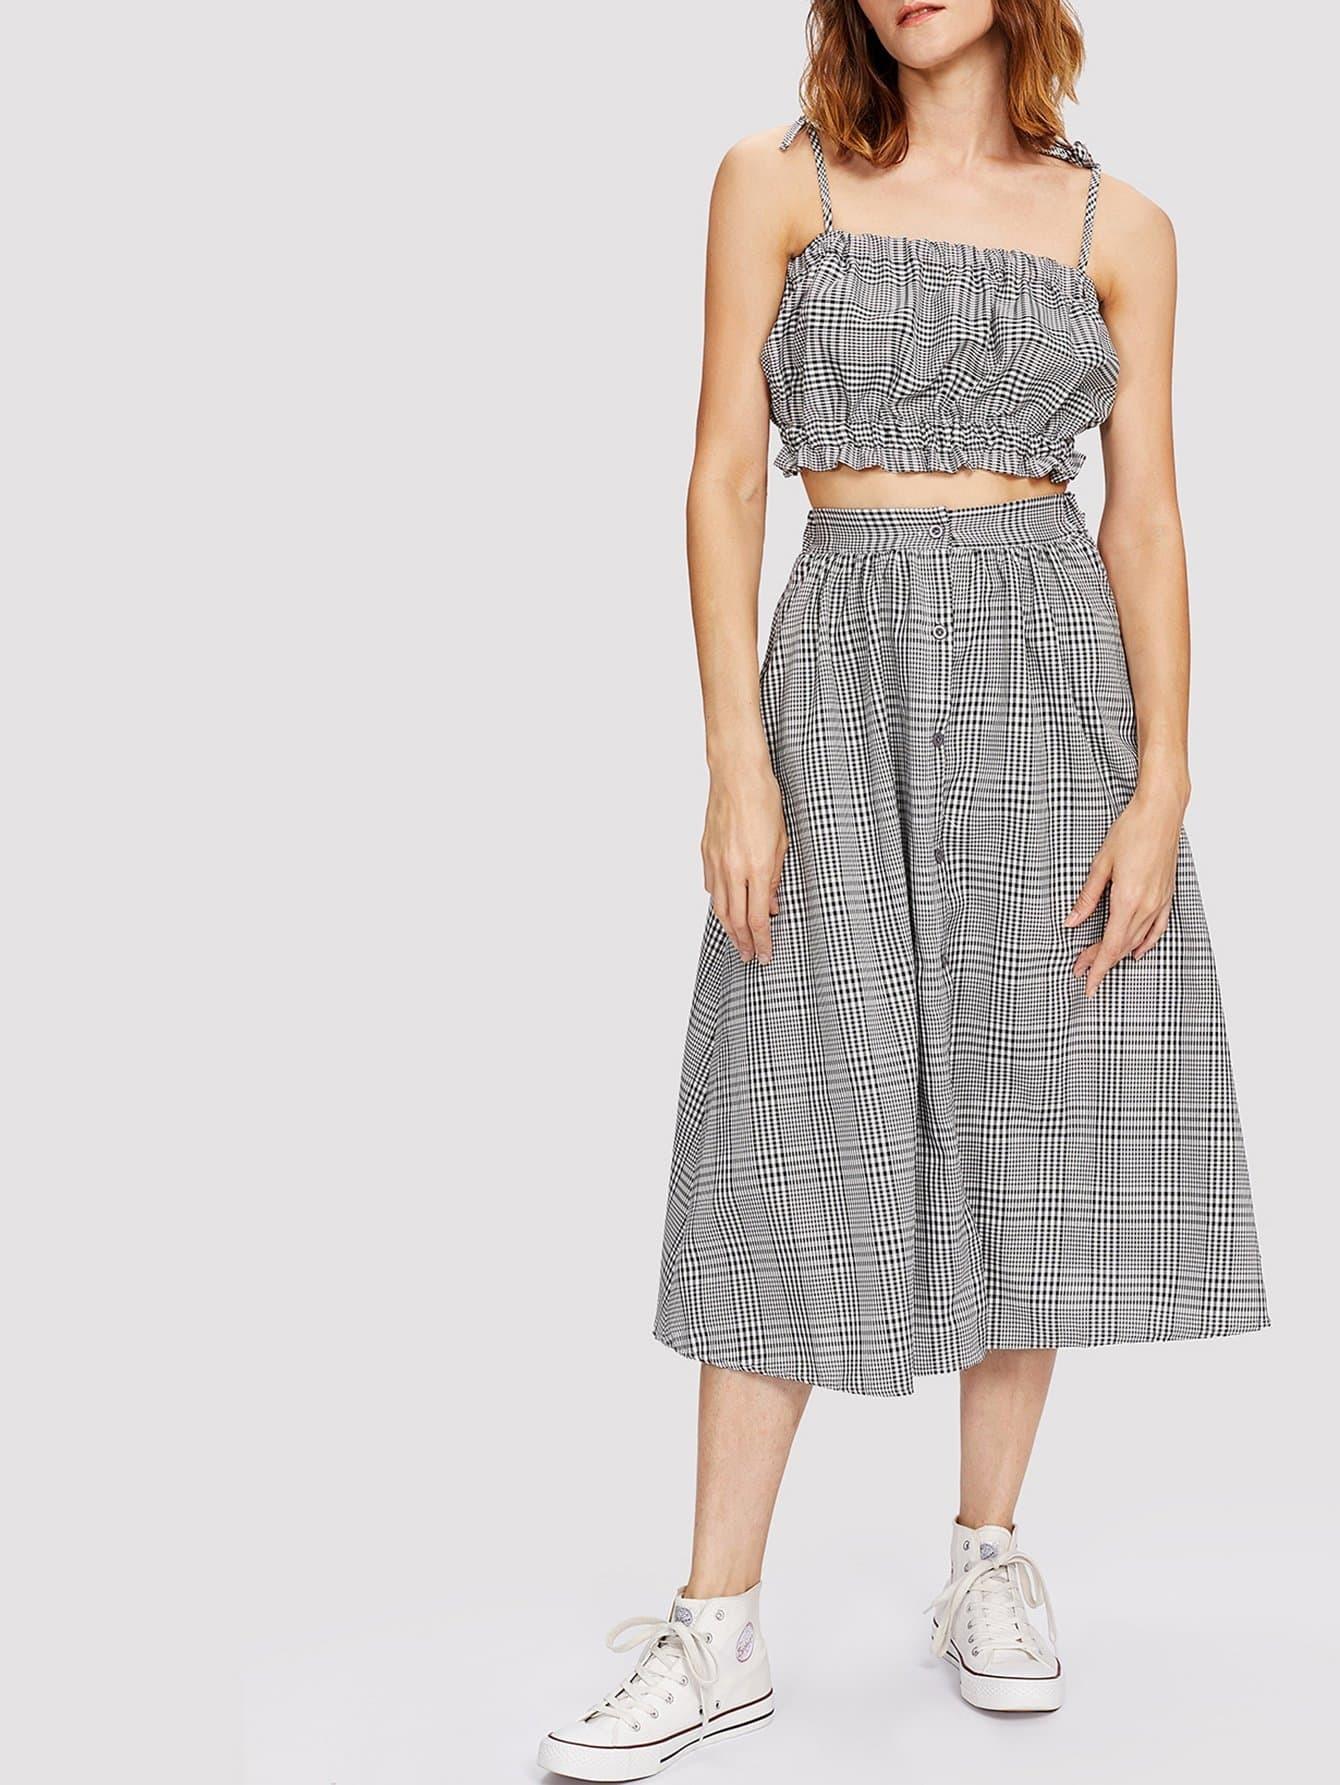 Frill Trim Plaid Crop Cami Top With Skirt plaid print crop top and skirt set